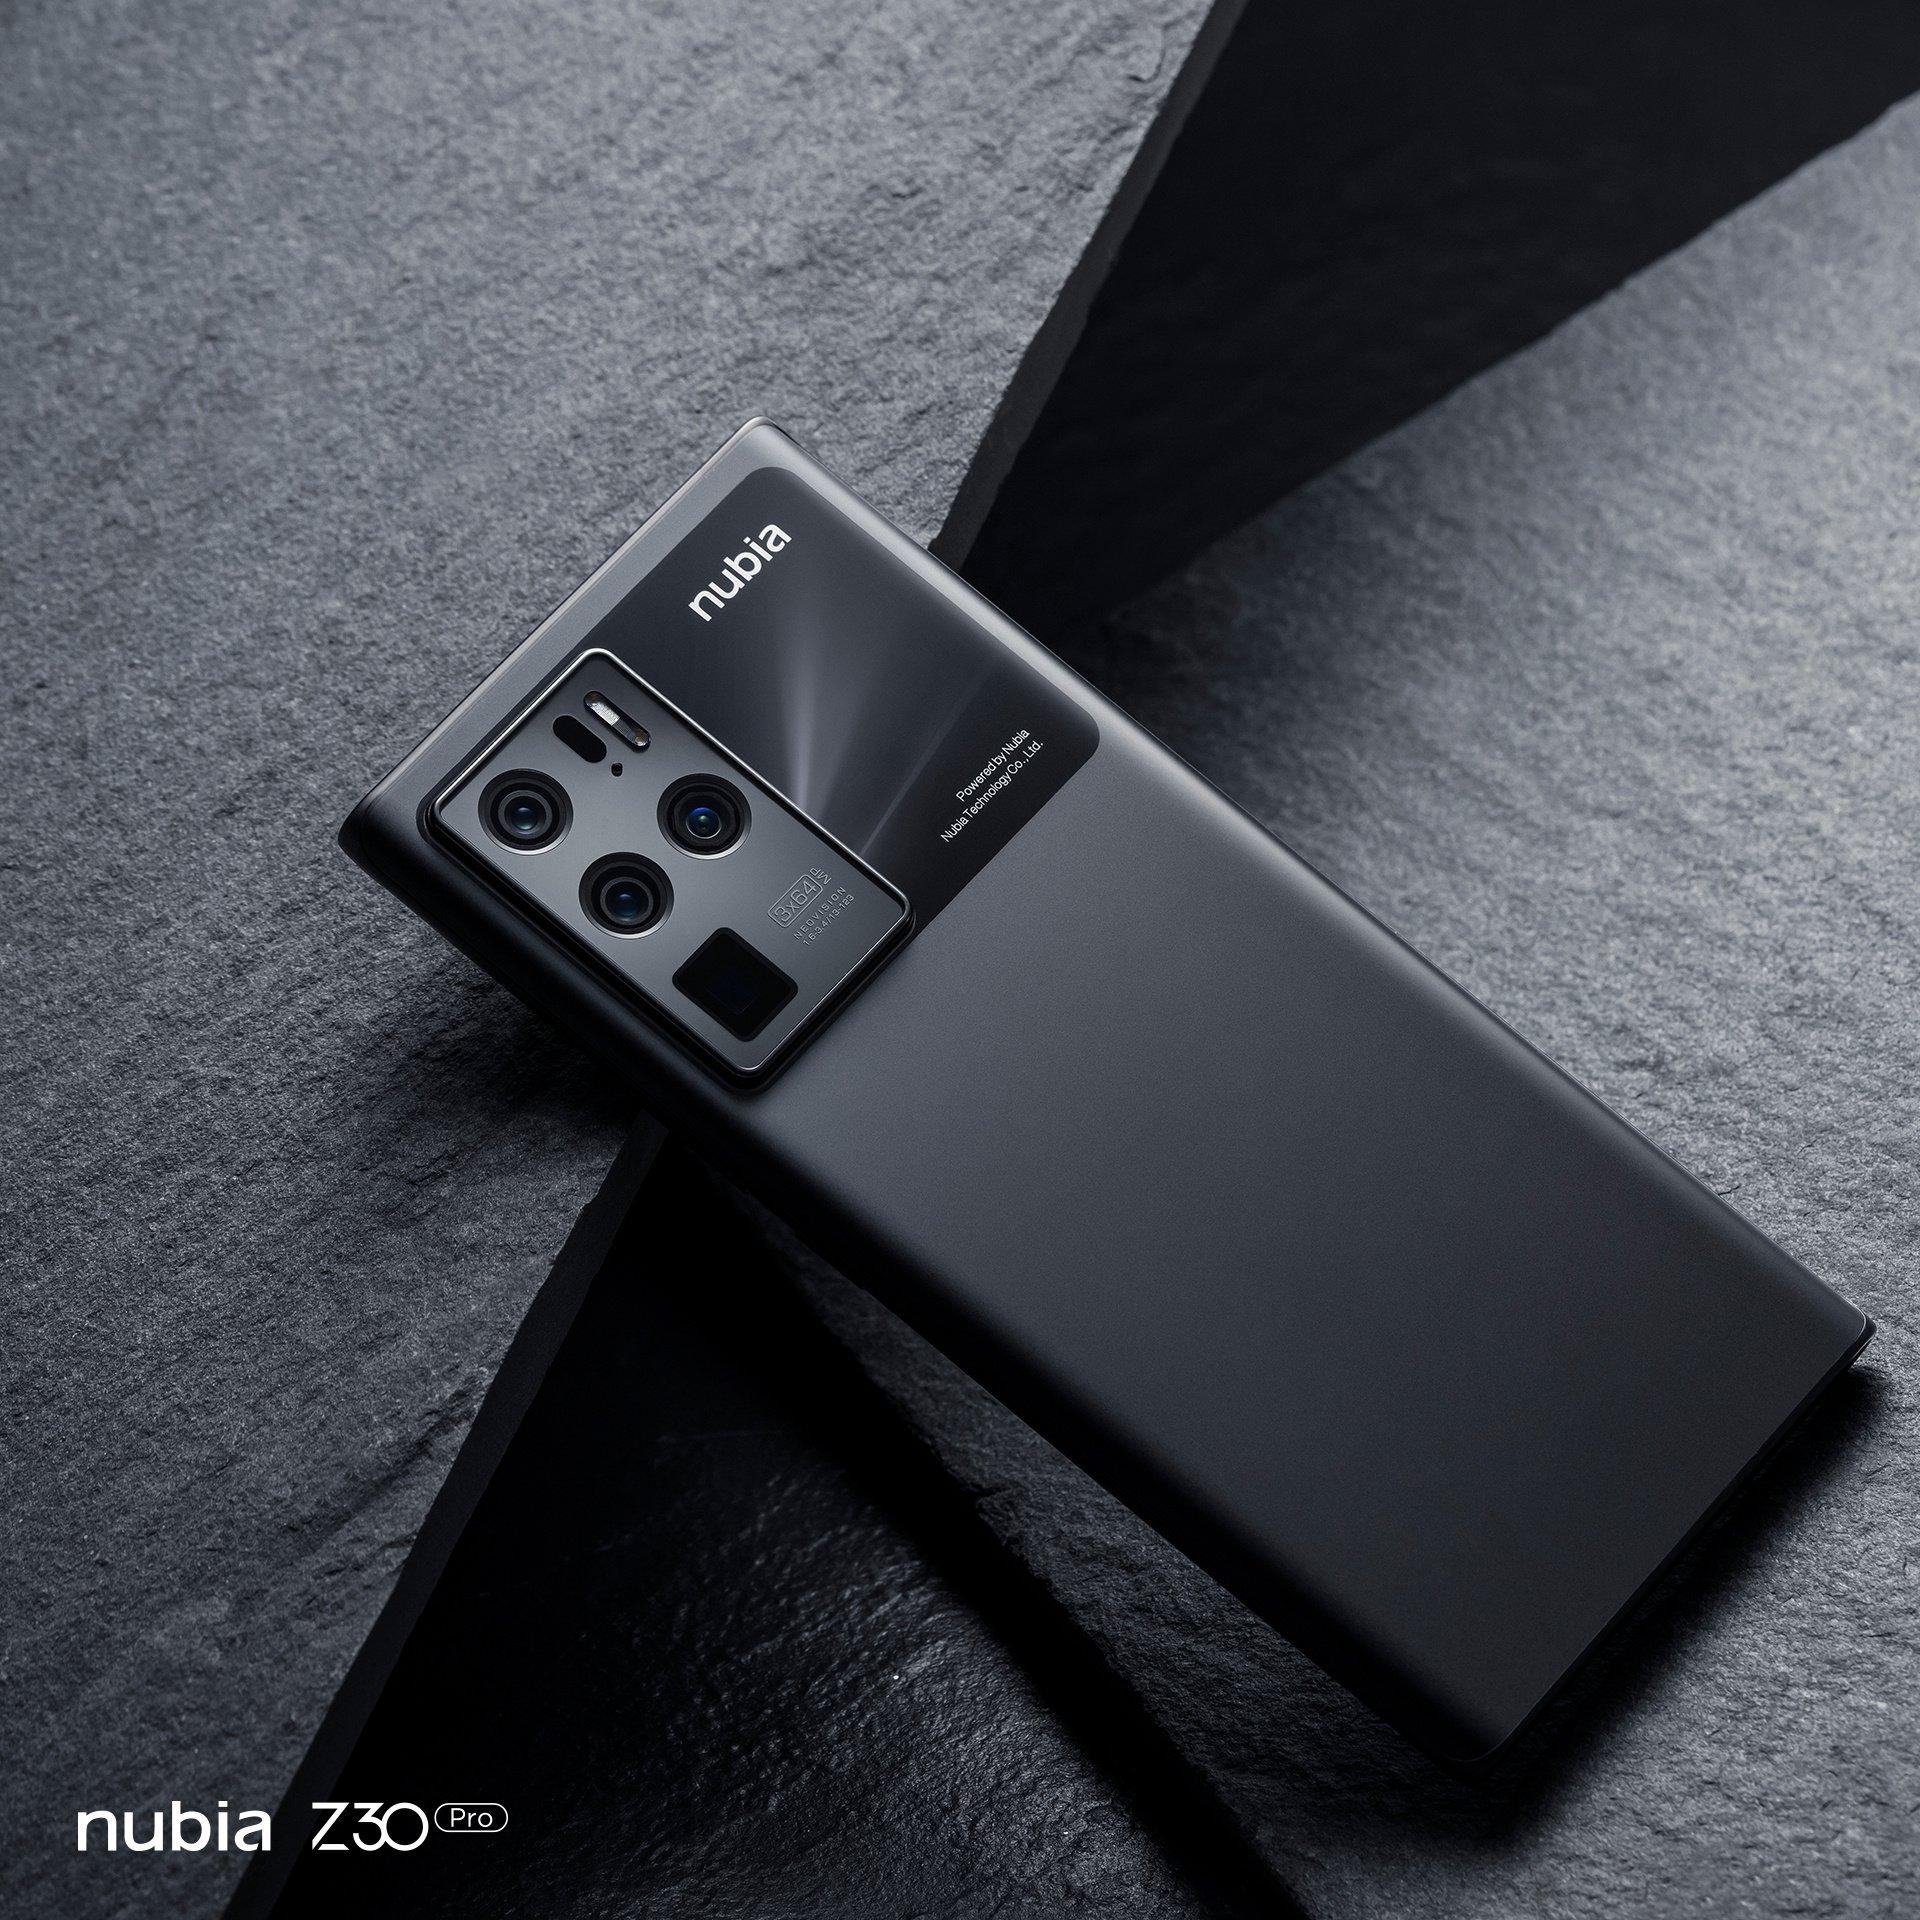 Nubia Z30 Pro Vast Black